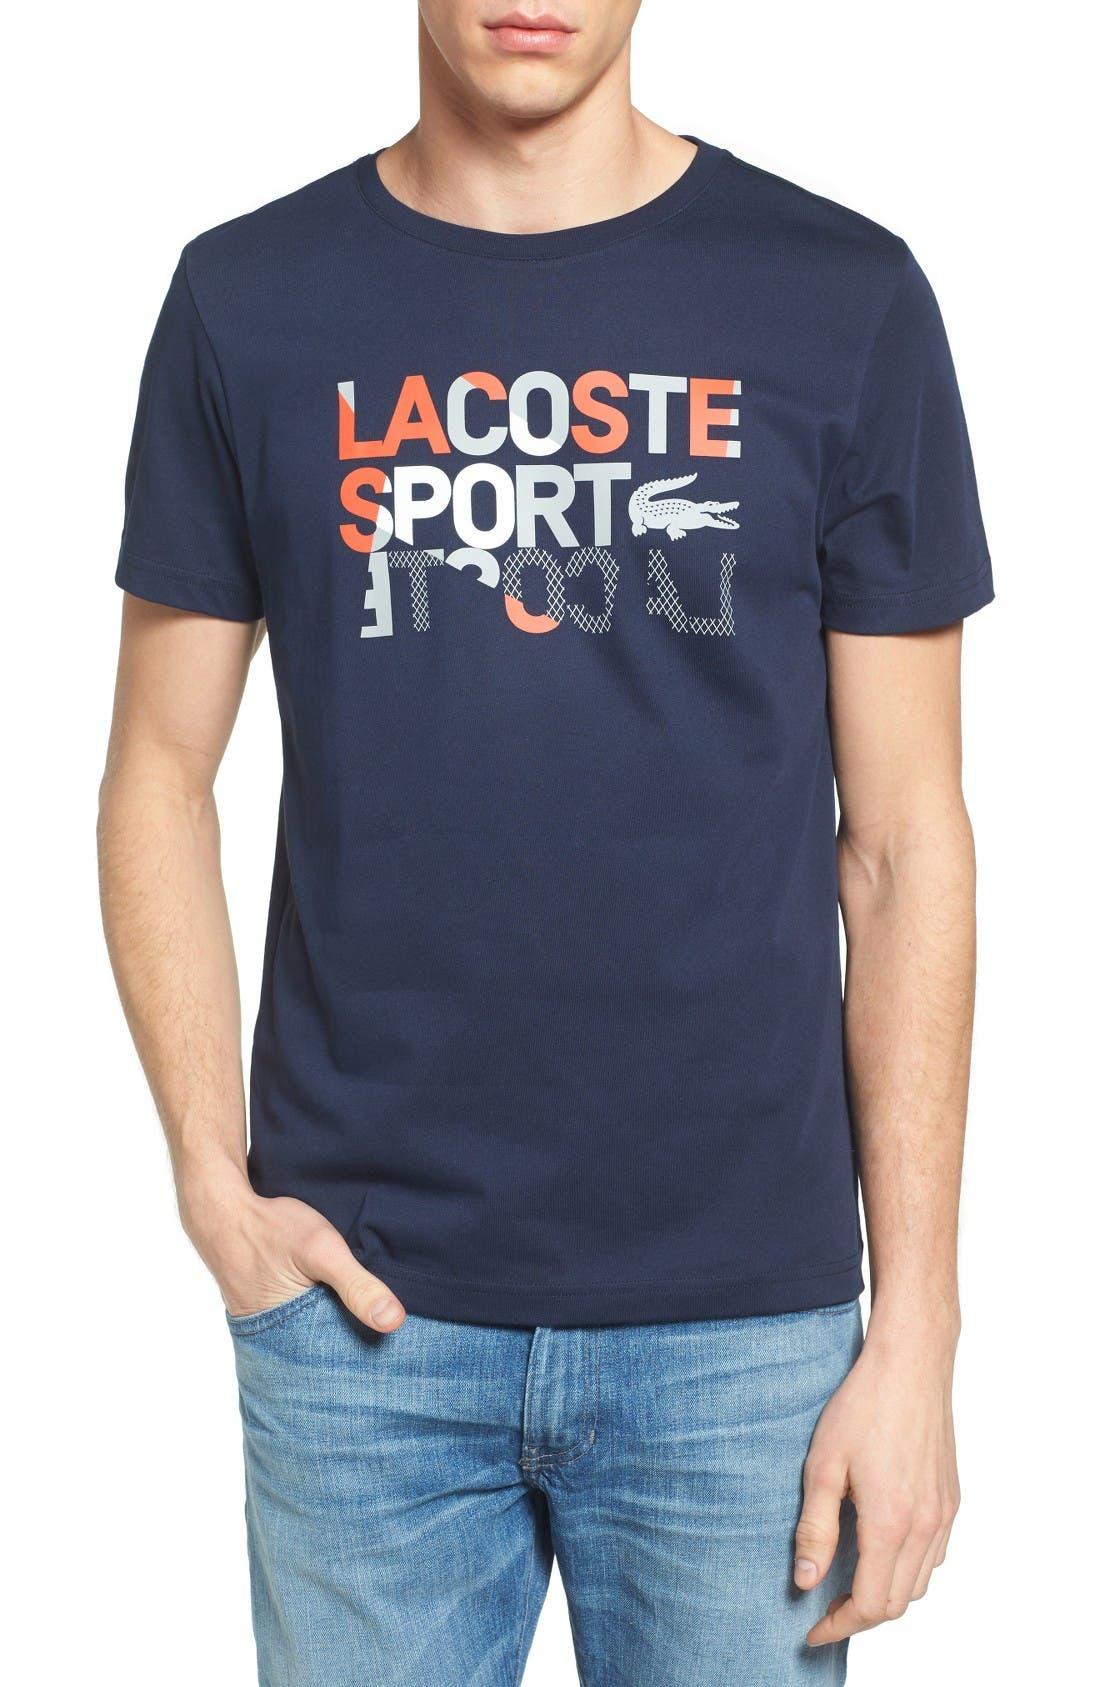 Lacoste Sport Graphic T-Shirt